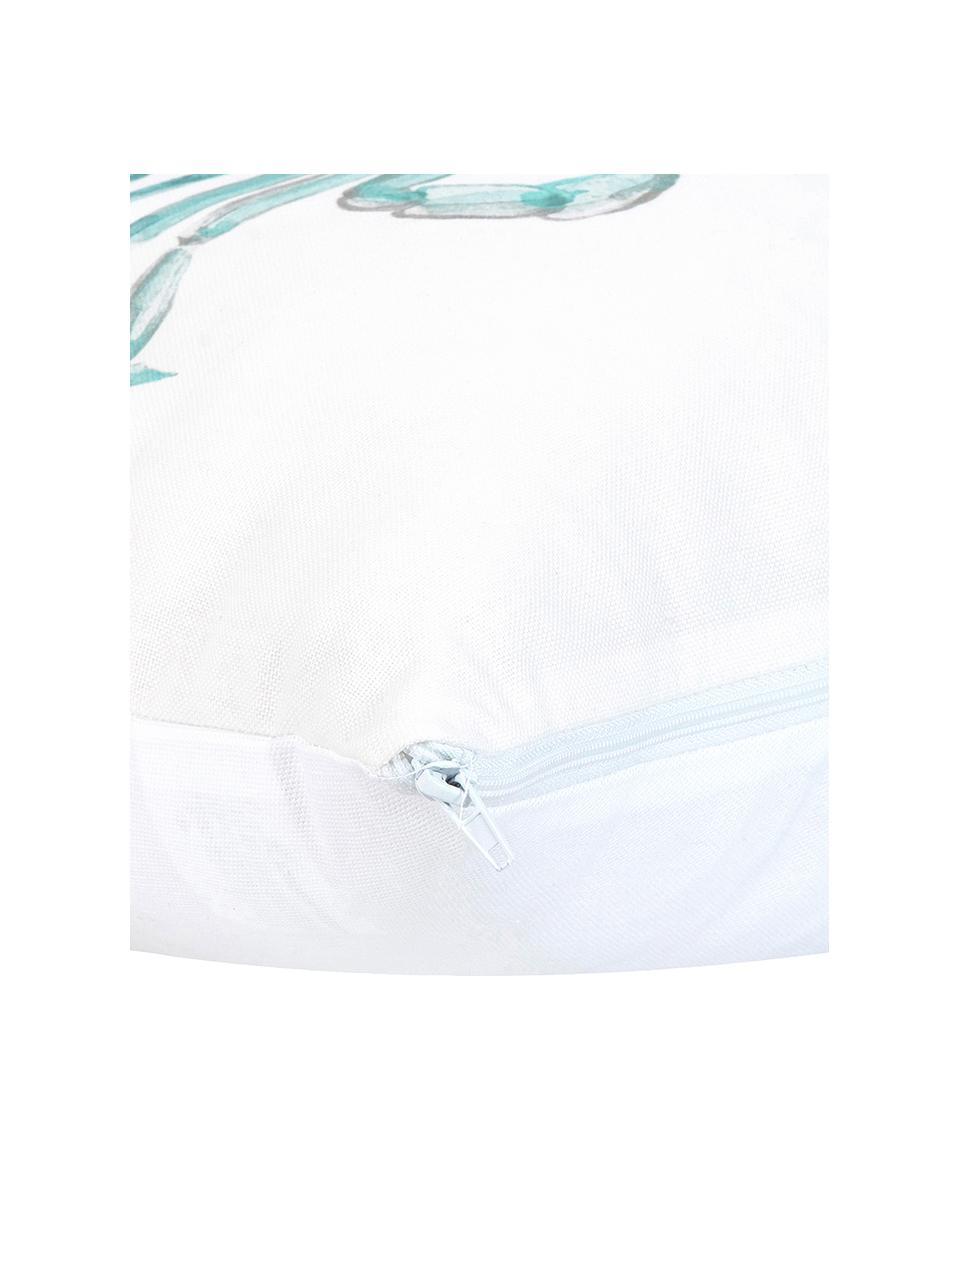 Kissenhülle Crabby mit Print in Aquarelloptik, 100% Baumwolle, Blau, Weiß, 40 x 40 cm